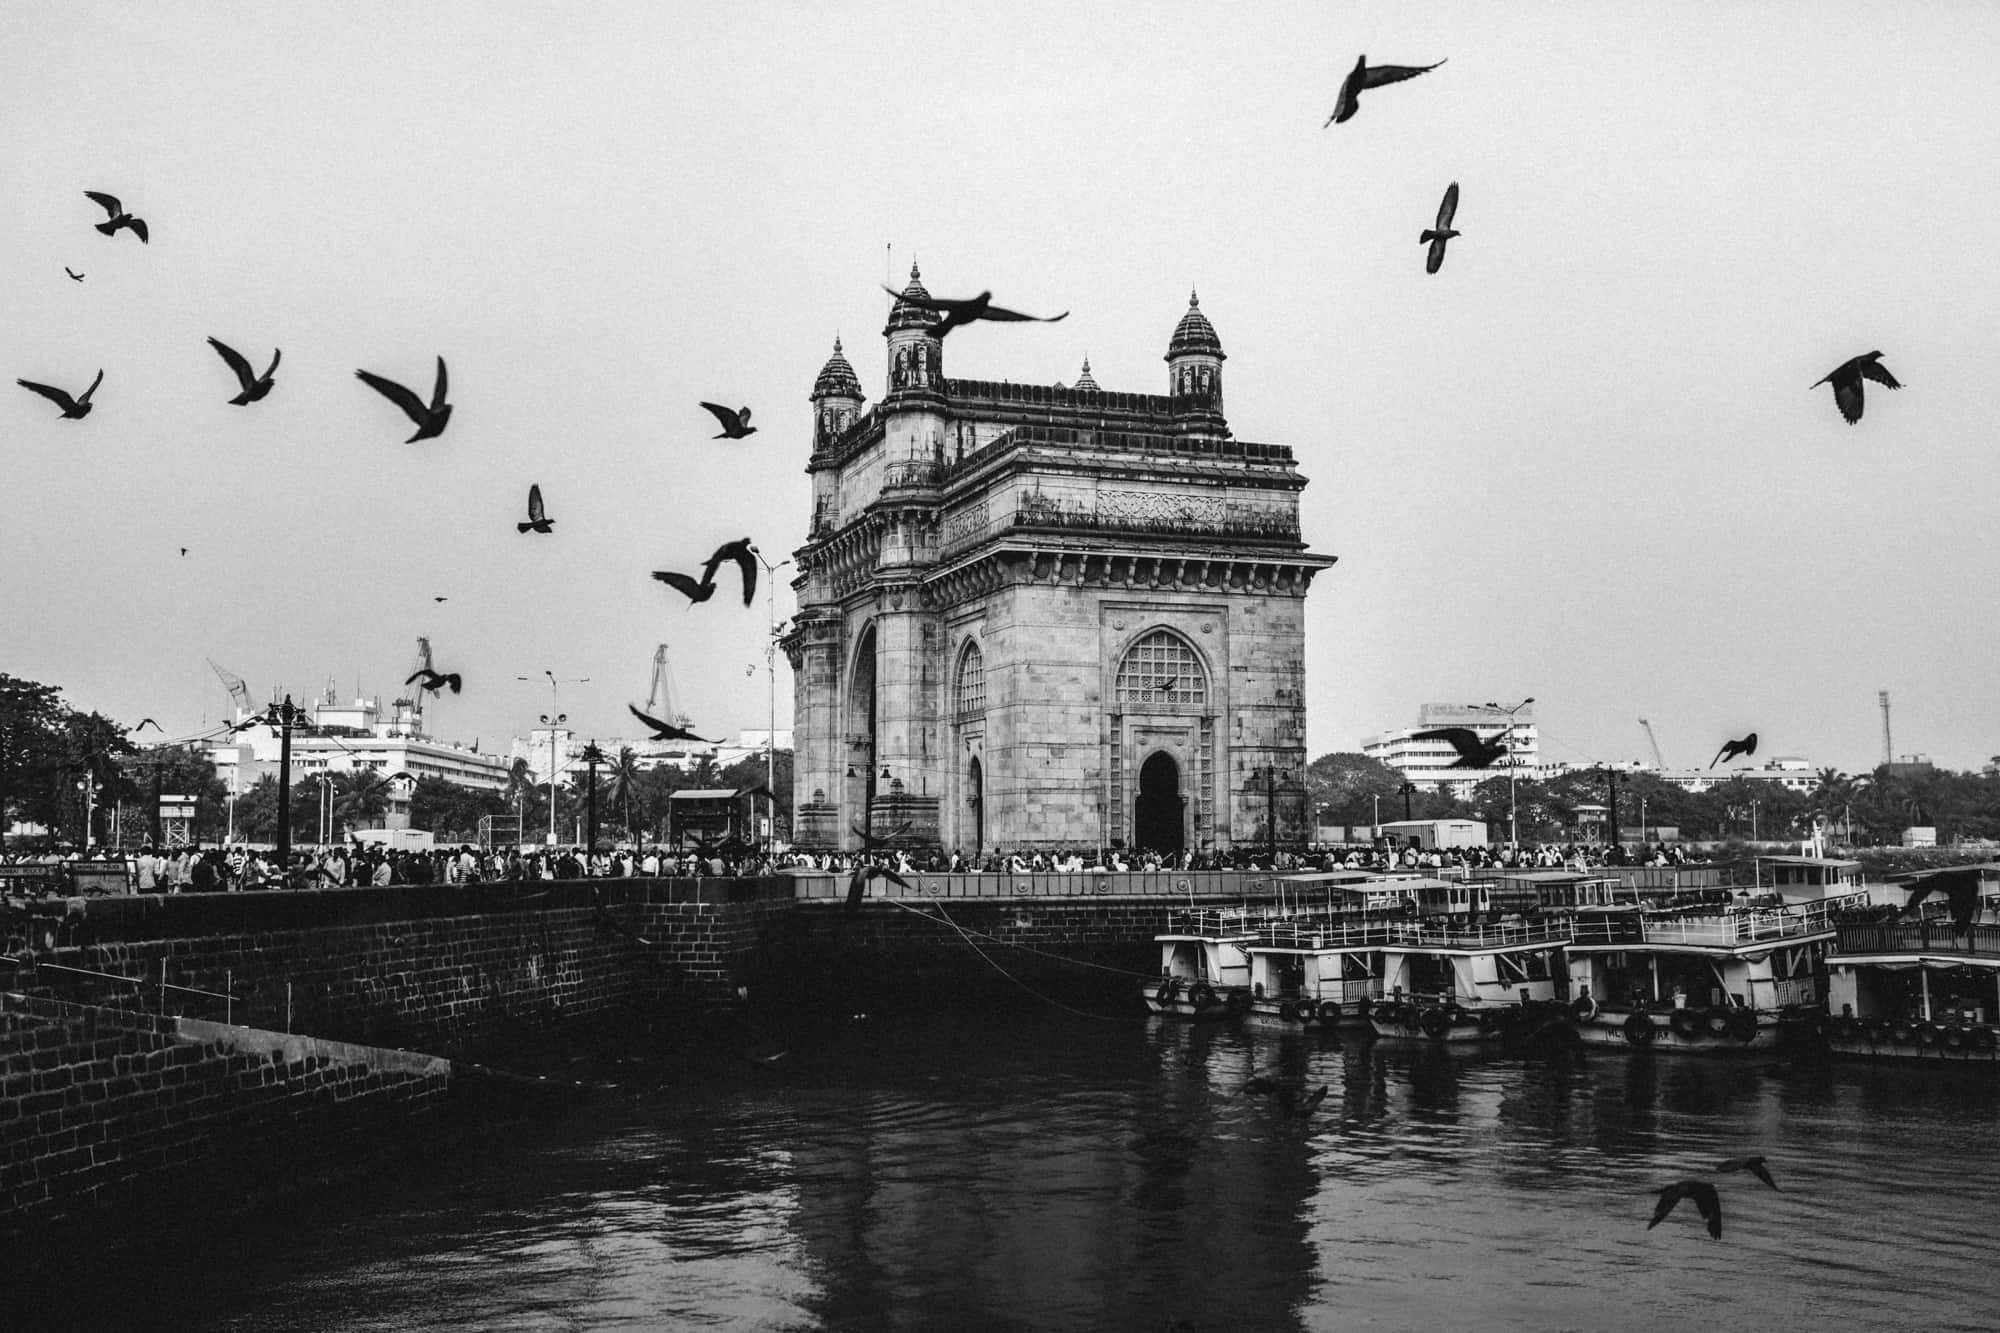 Sylt Fotograf Sylt Heiraten auf Sylt Hochzeitsfotograf Sylt Indien Mumbai